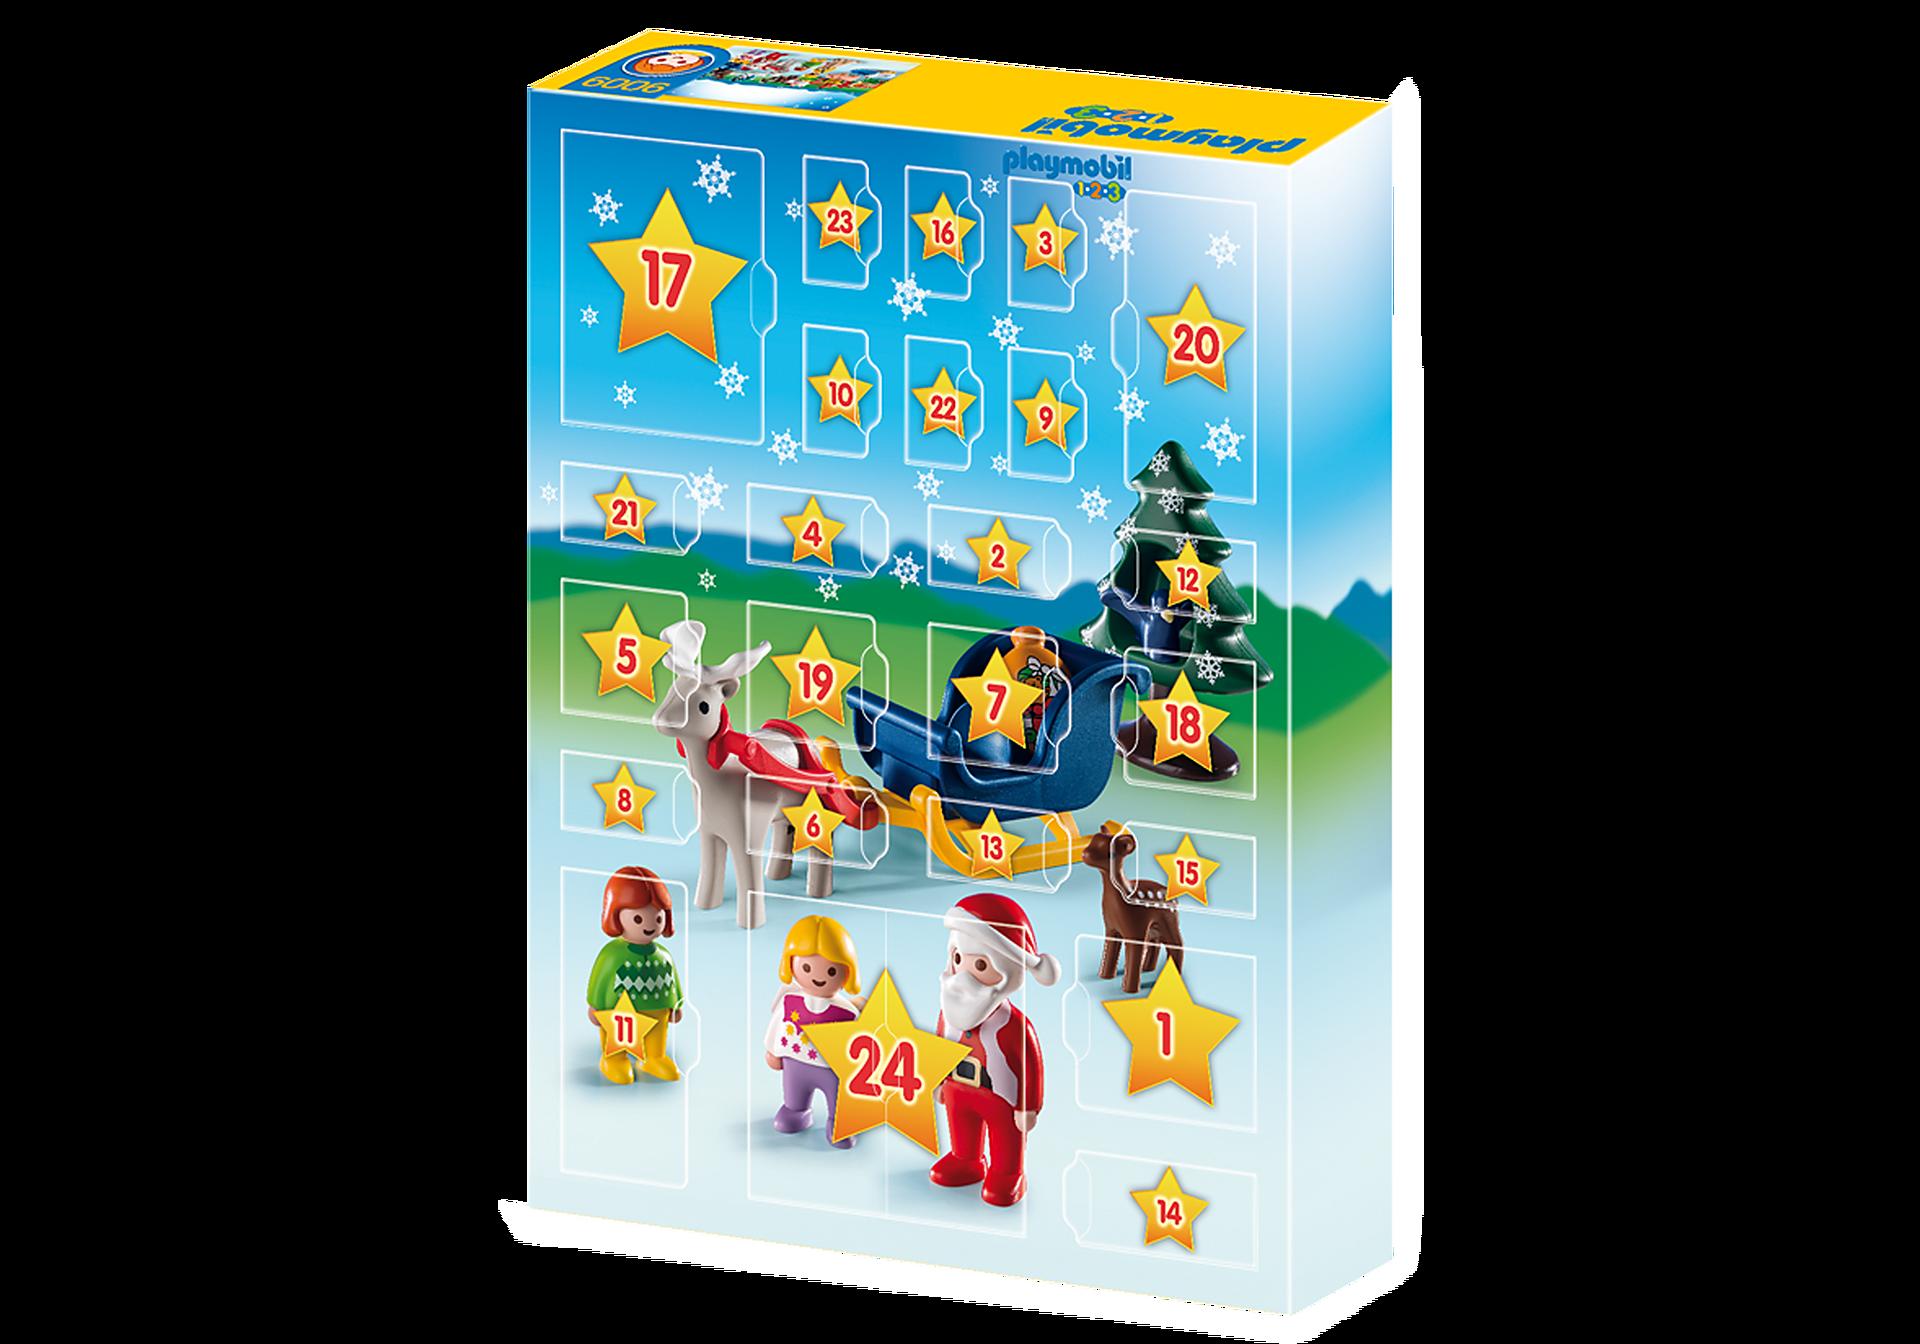 http://media.playmobil.com/i/playmobil/9009_product_extra2/1.2.3 Advent Calendar Christmas on the Farm